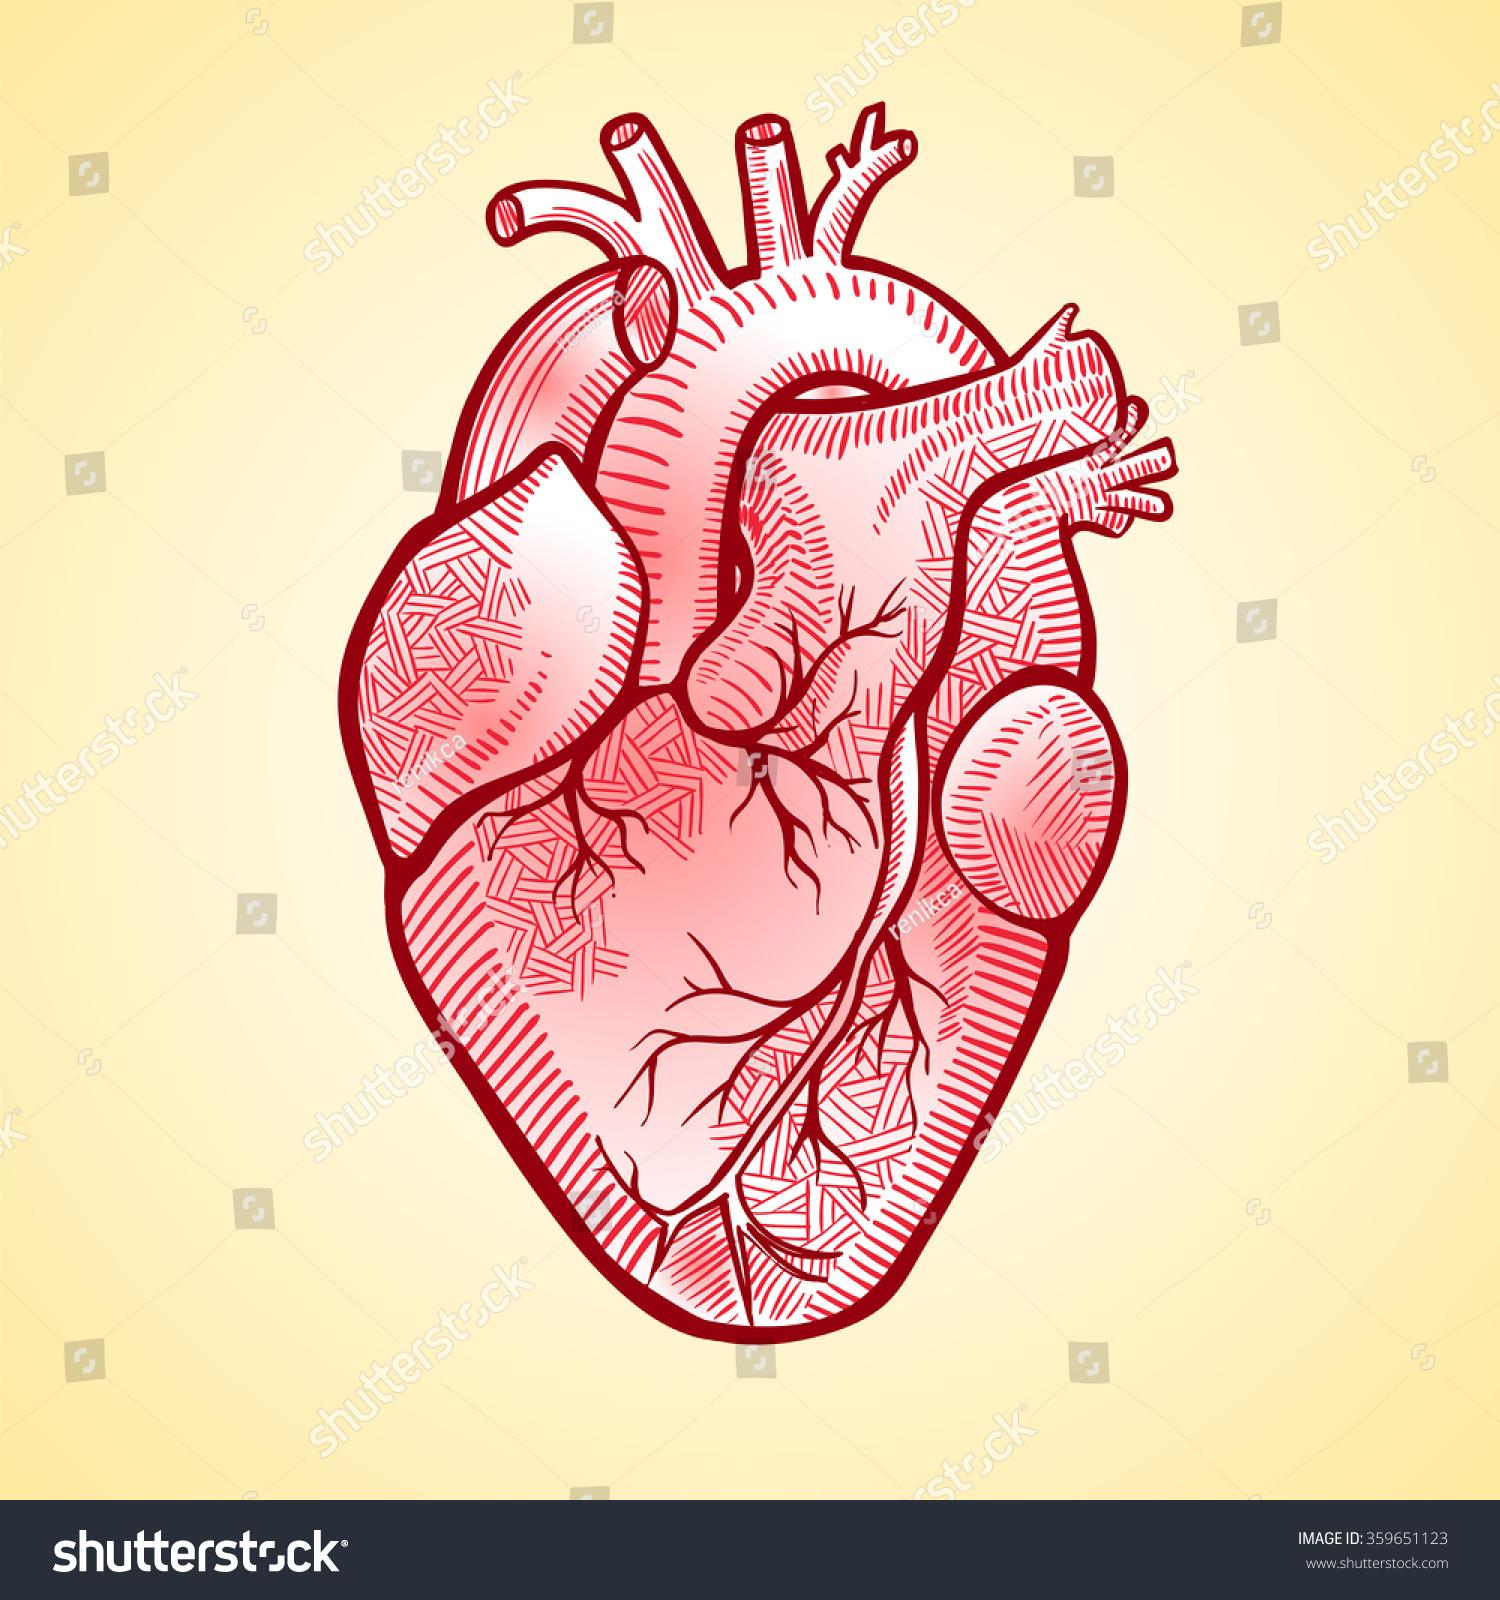 Human Anatomical Heart Made Graphic Art Stock Vector Royalty Free